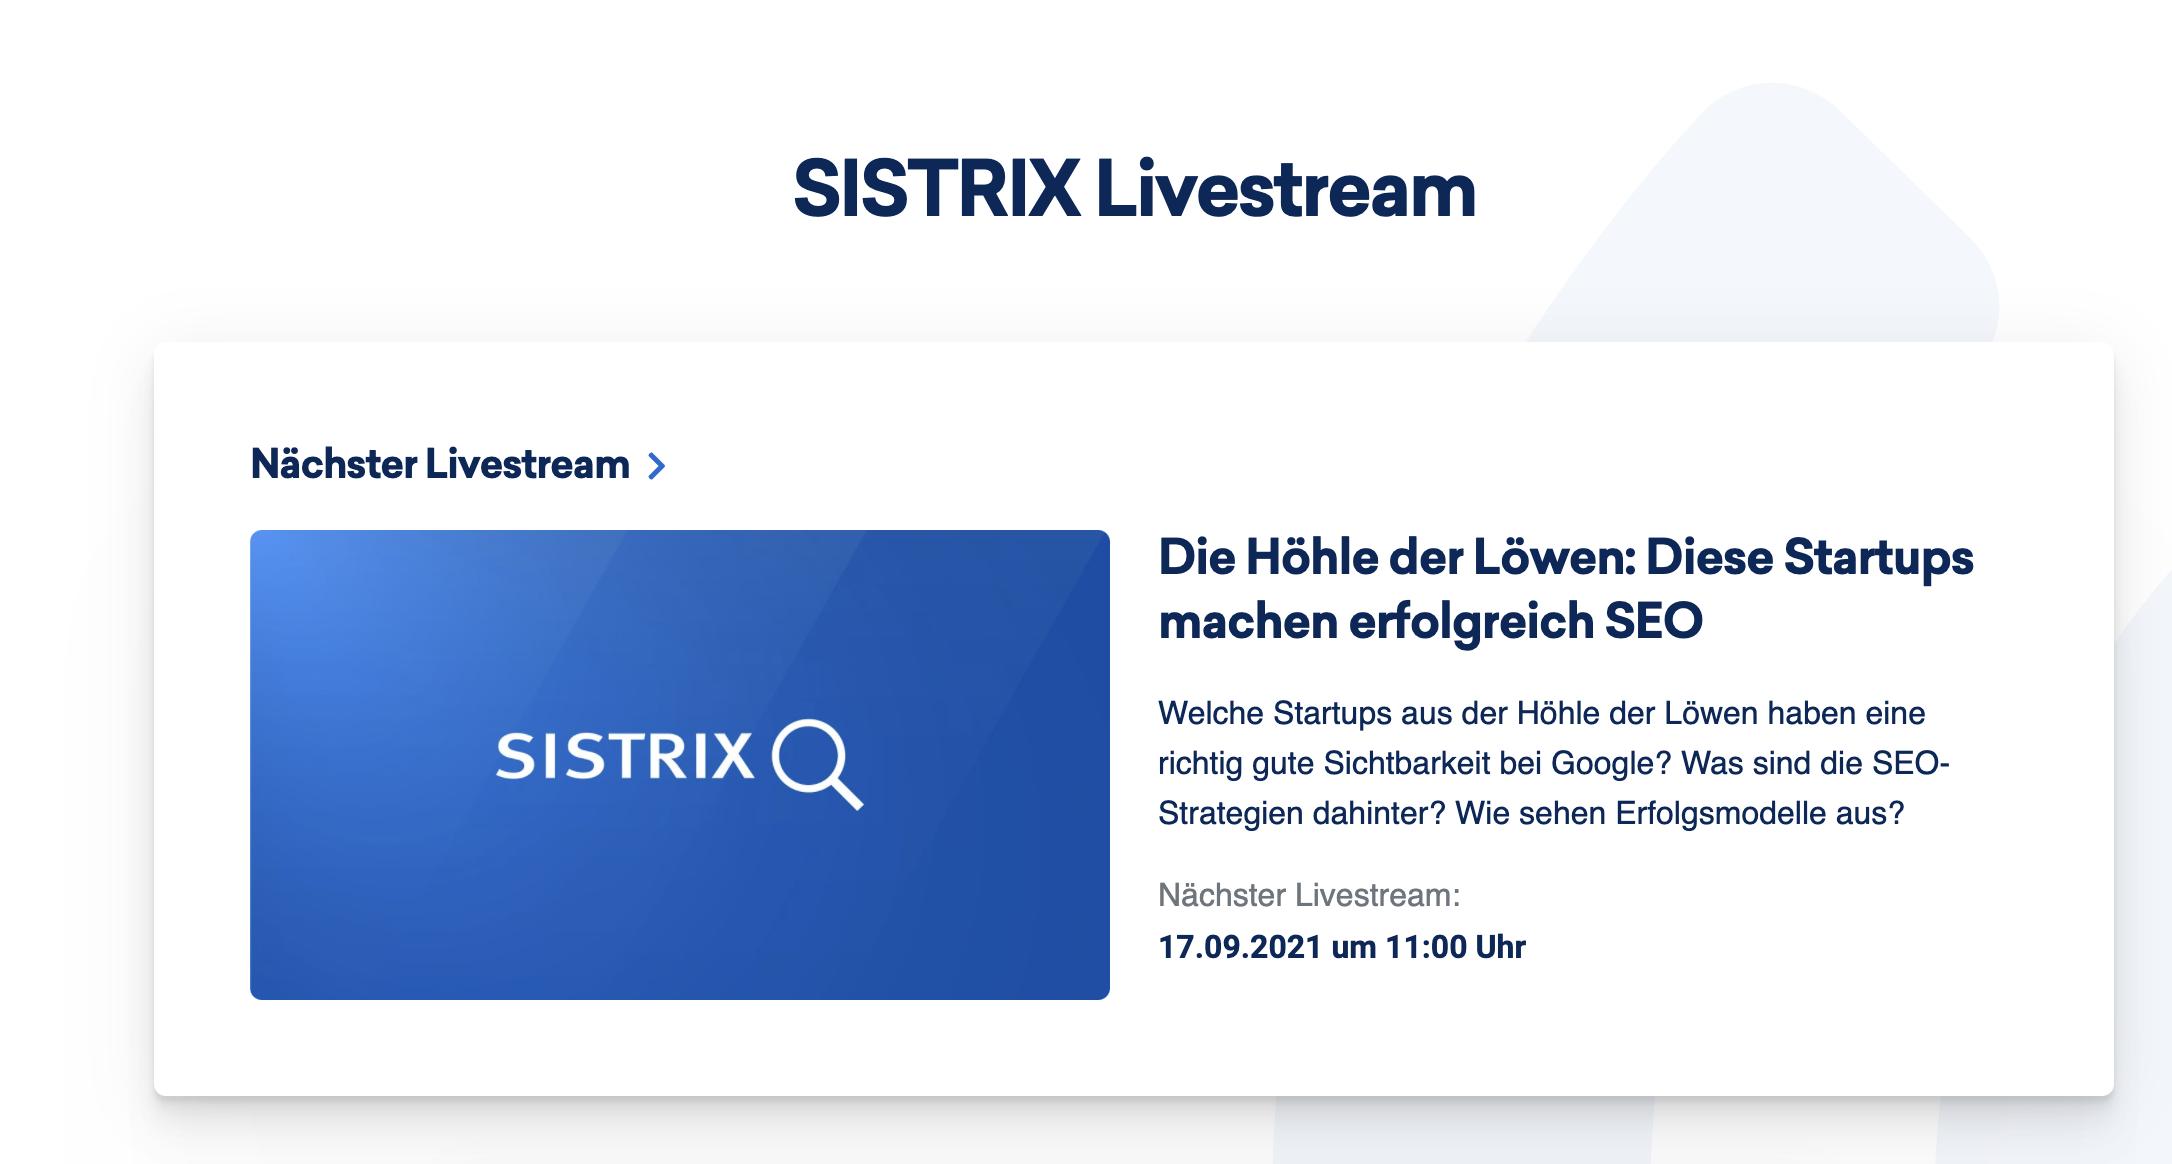 Sistrix Livestream